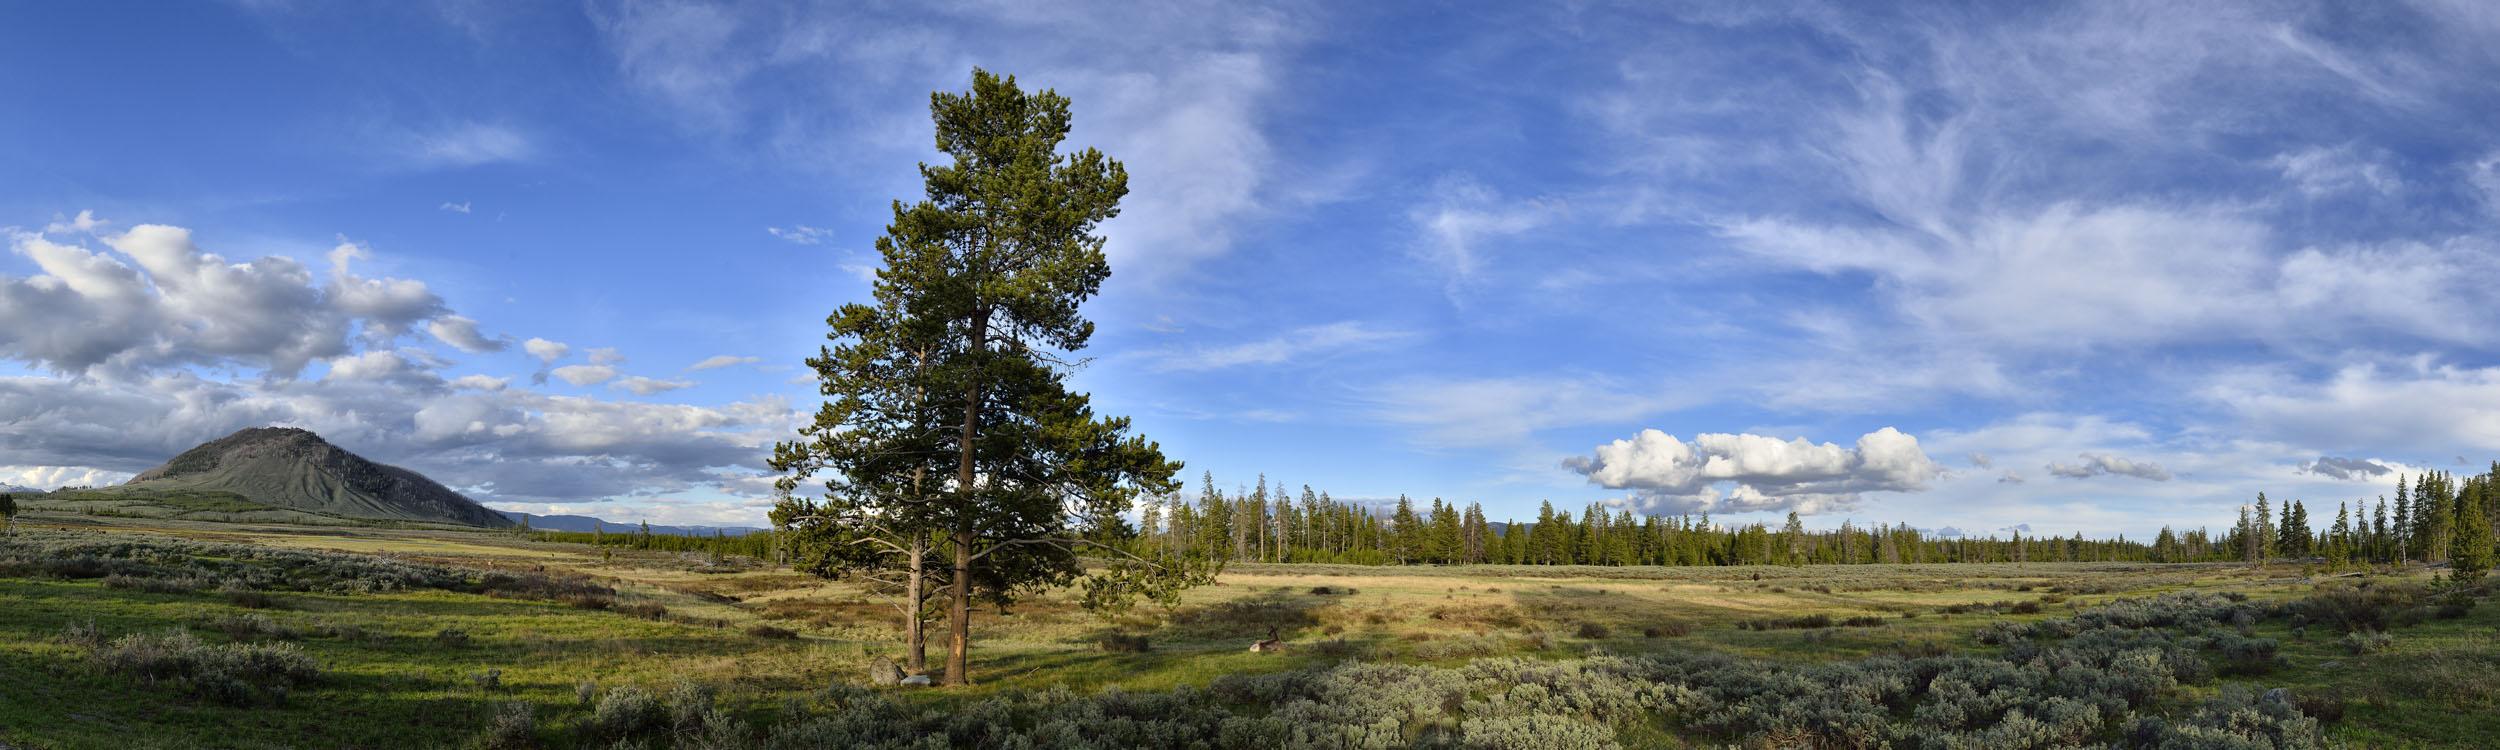 Meadow in Gallatin Range